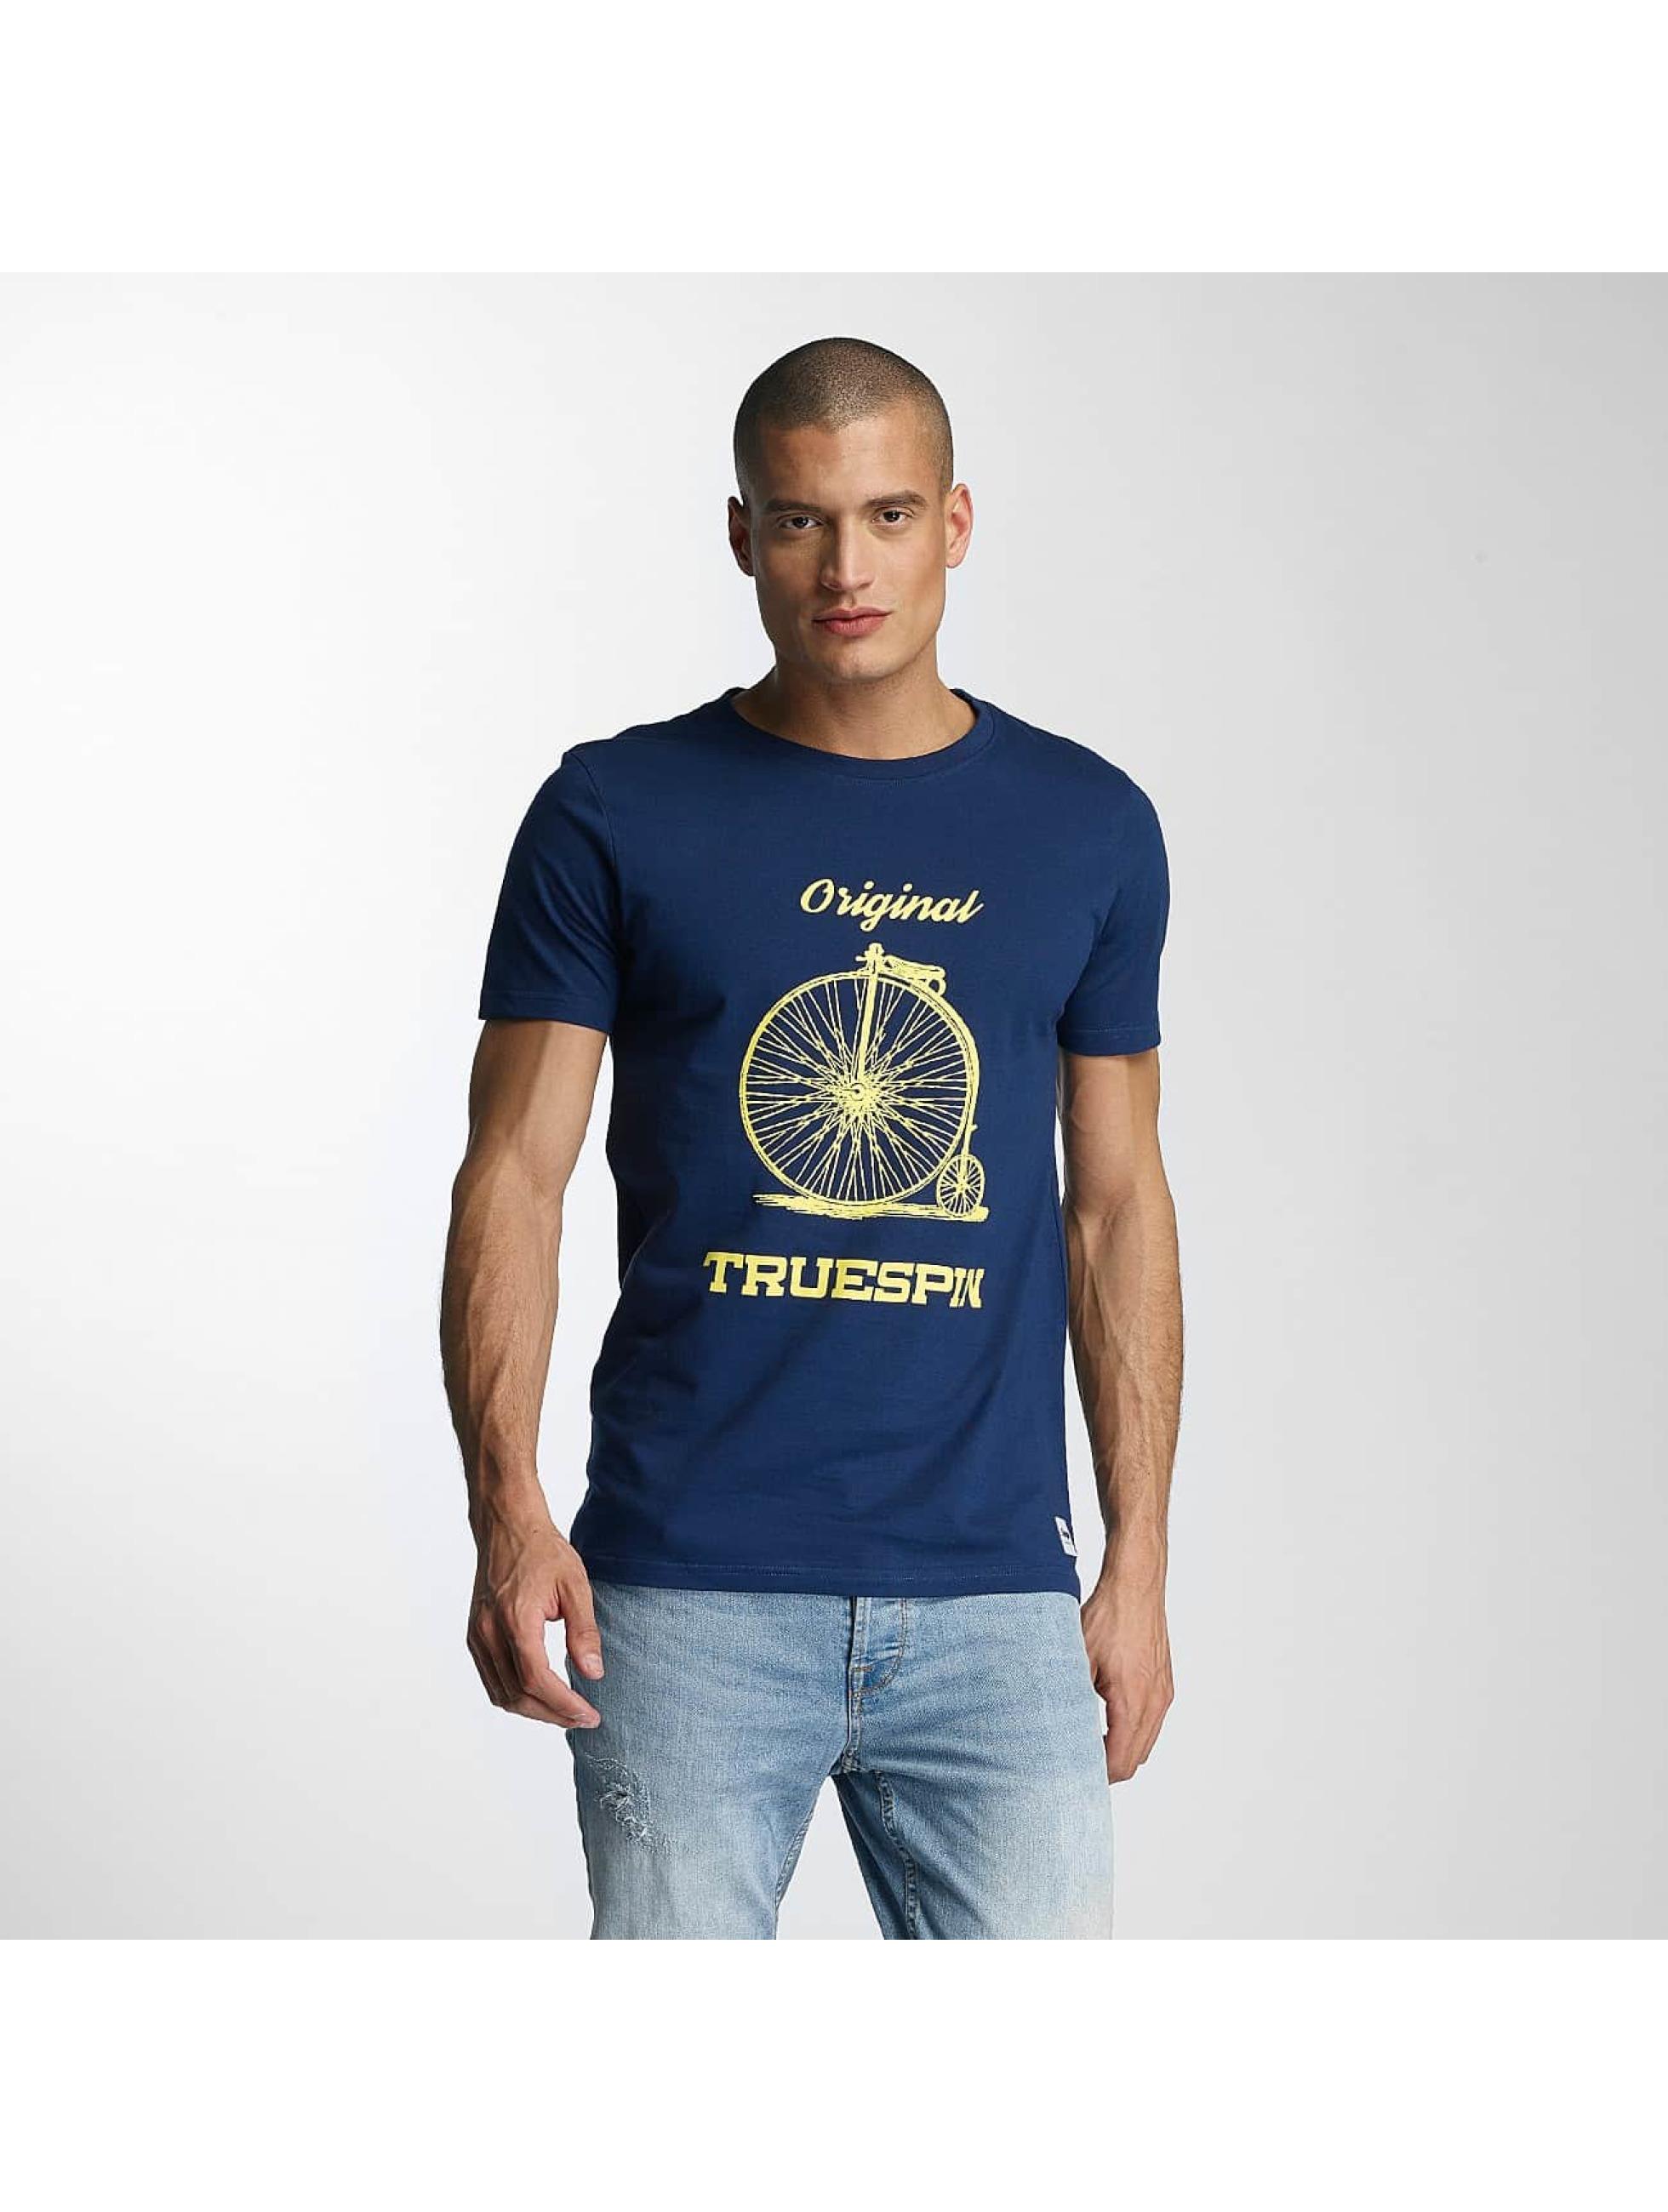 TrueSpin Tričká 6 modrá